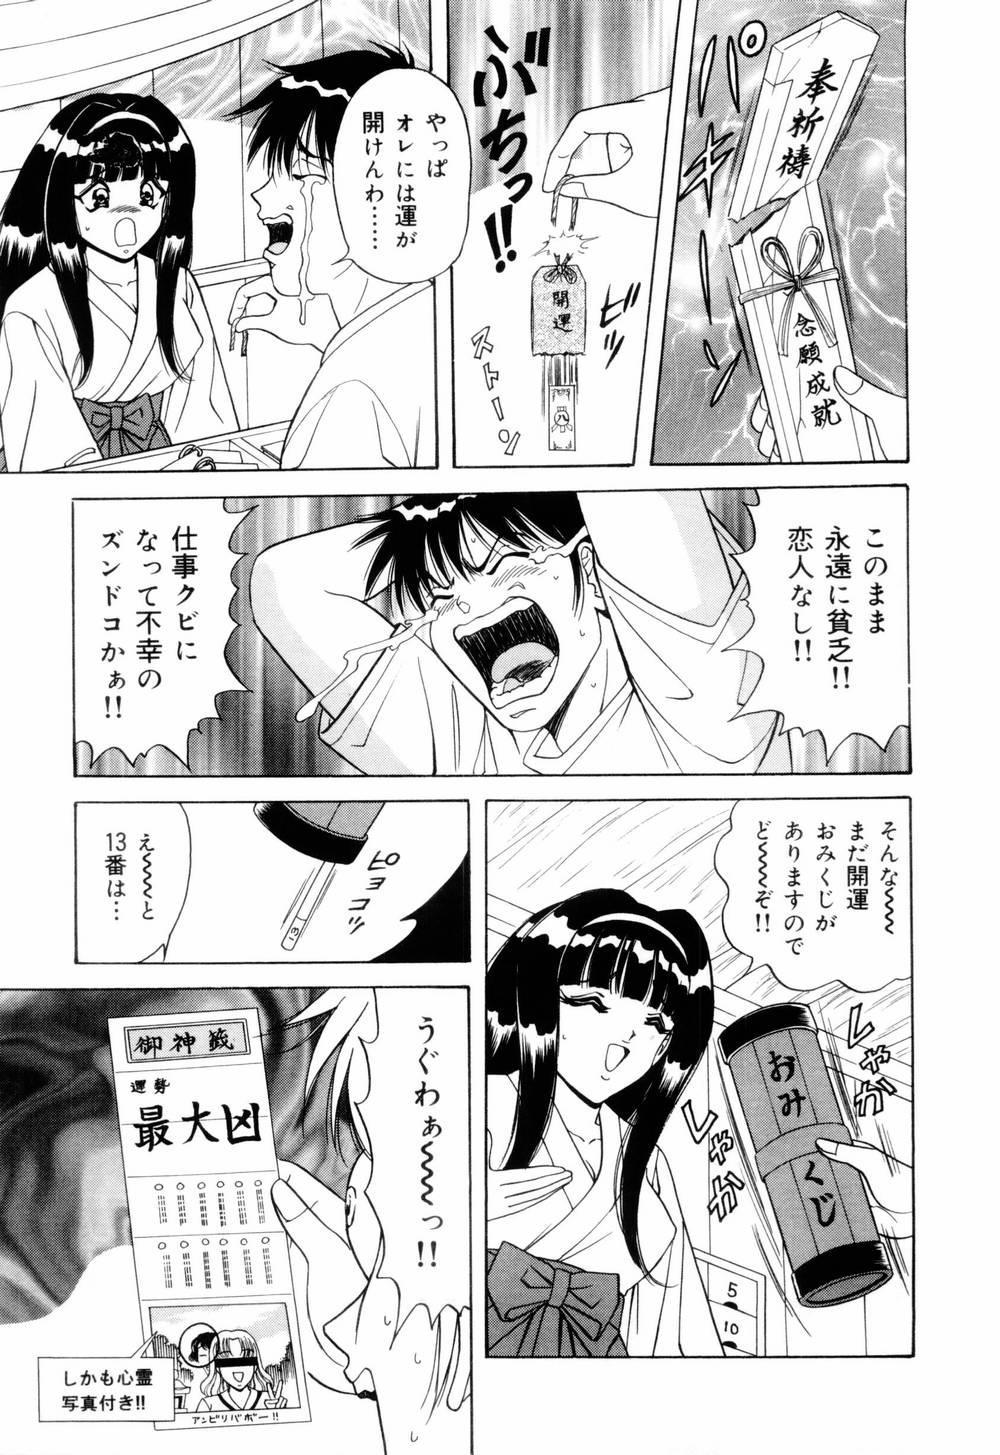 SuiCup Joshi Announcer Jikkyo Chukei Rape 146